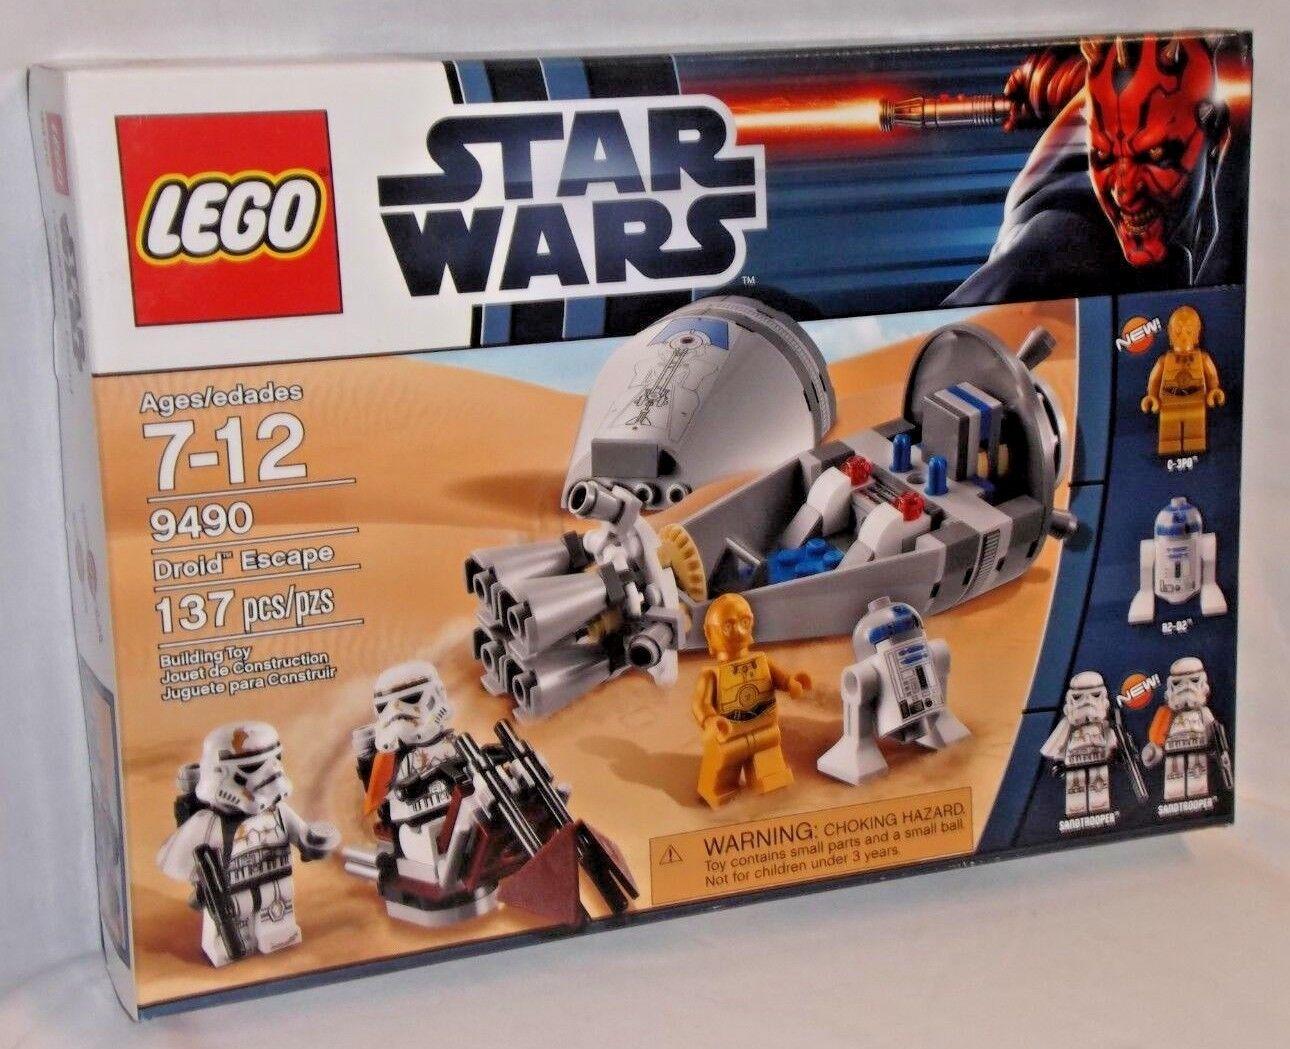 SEALED 9490 LEGO Star Wars DROID ESCAPE C-3PO R2-D2 Sandtrooper Spaceship 137 pc